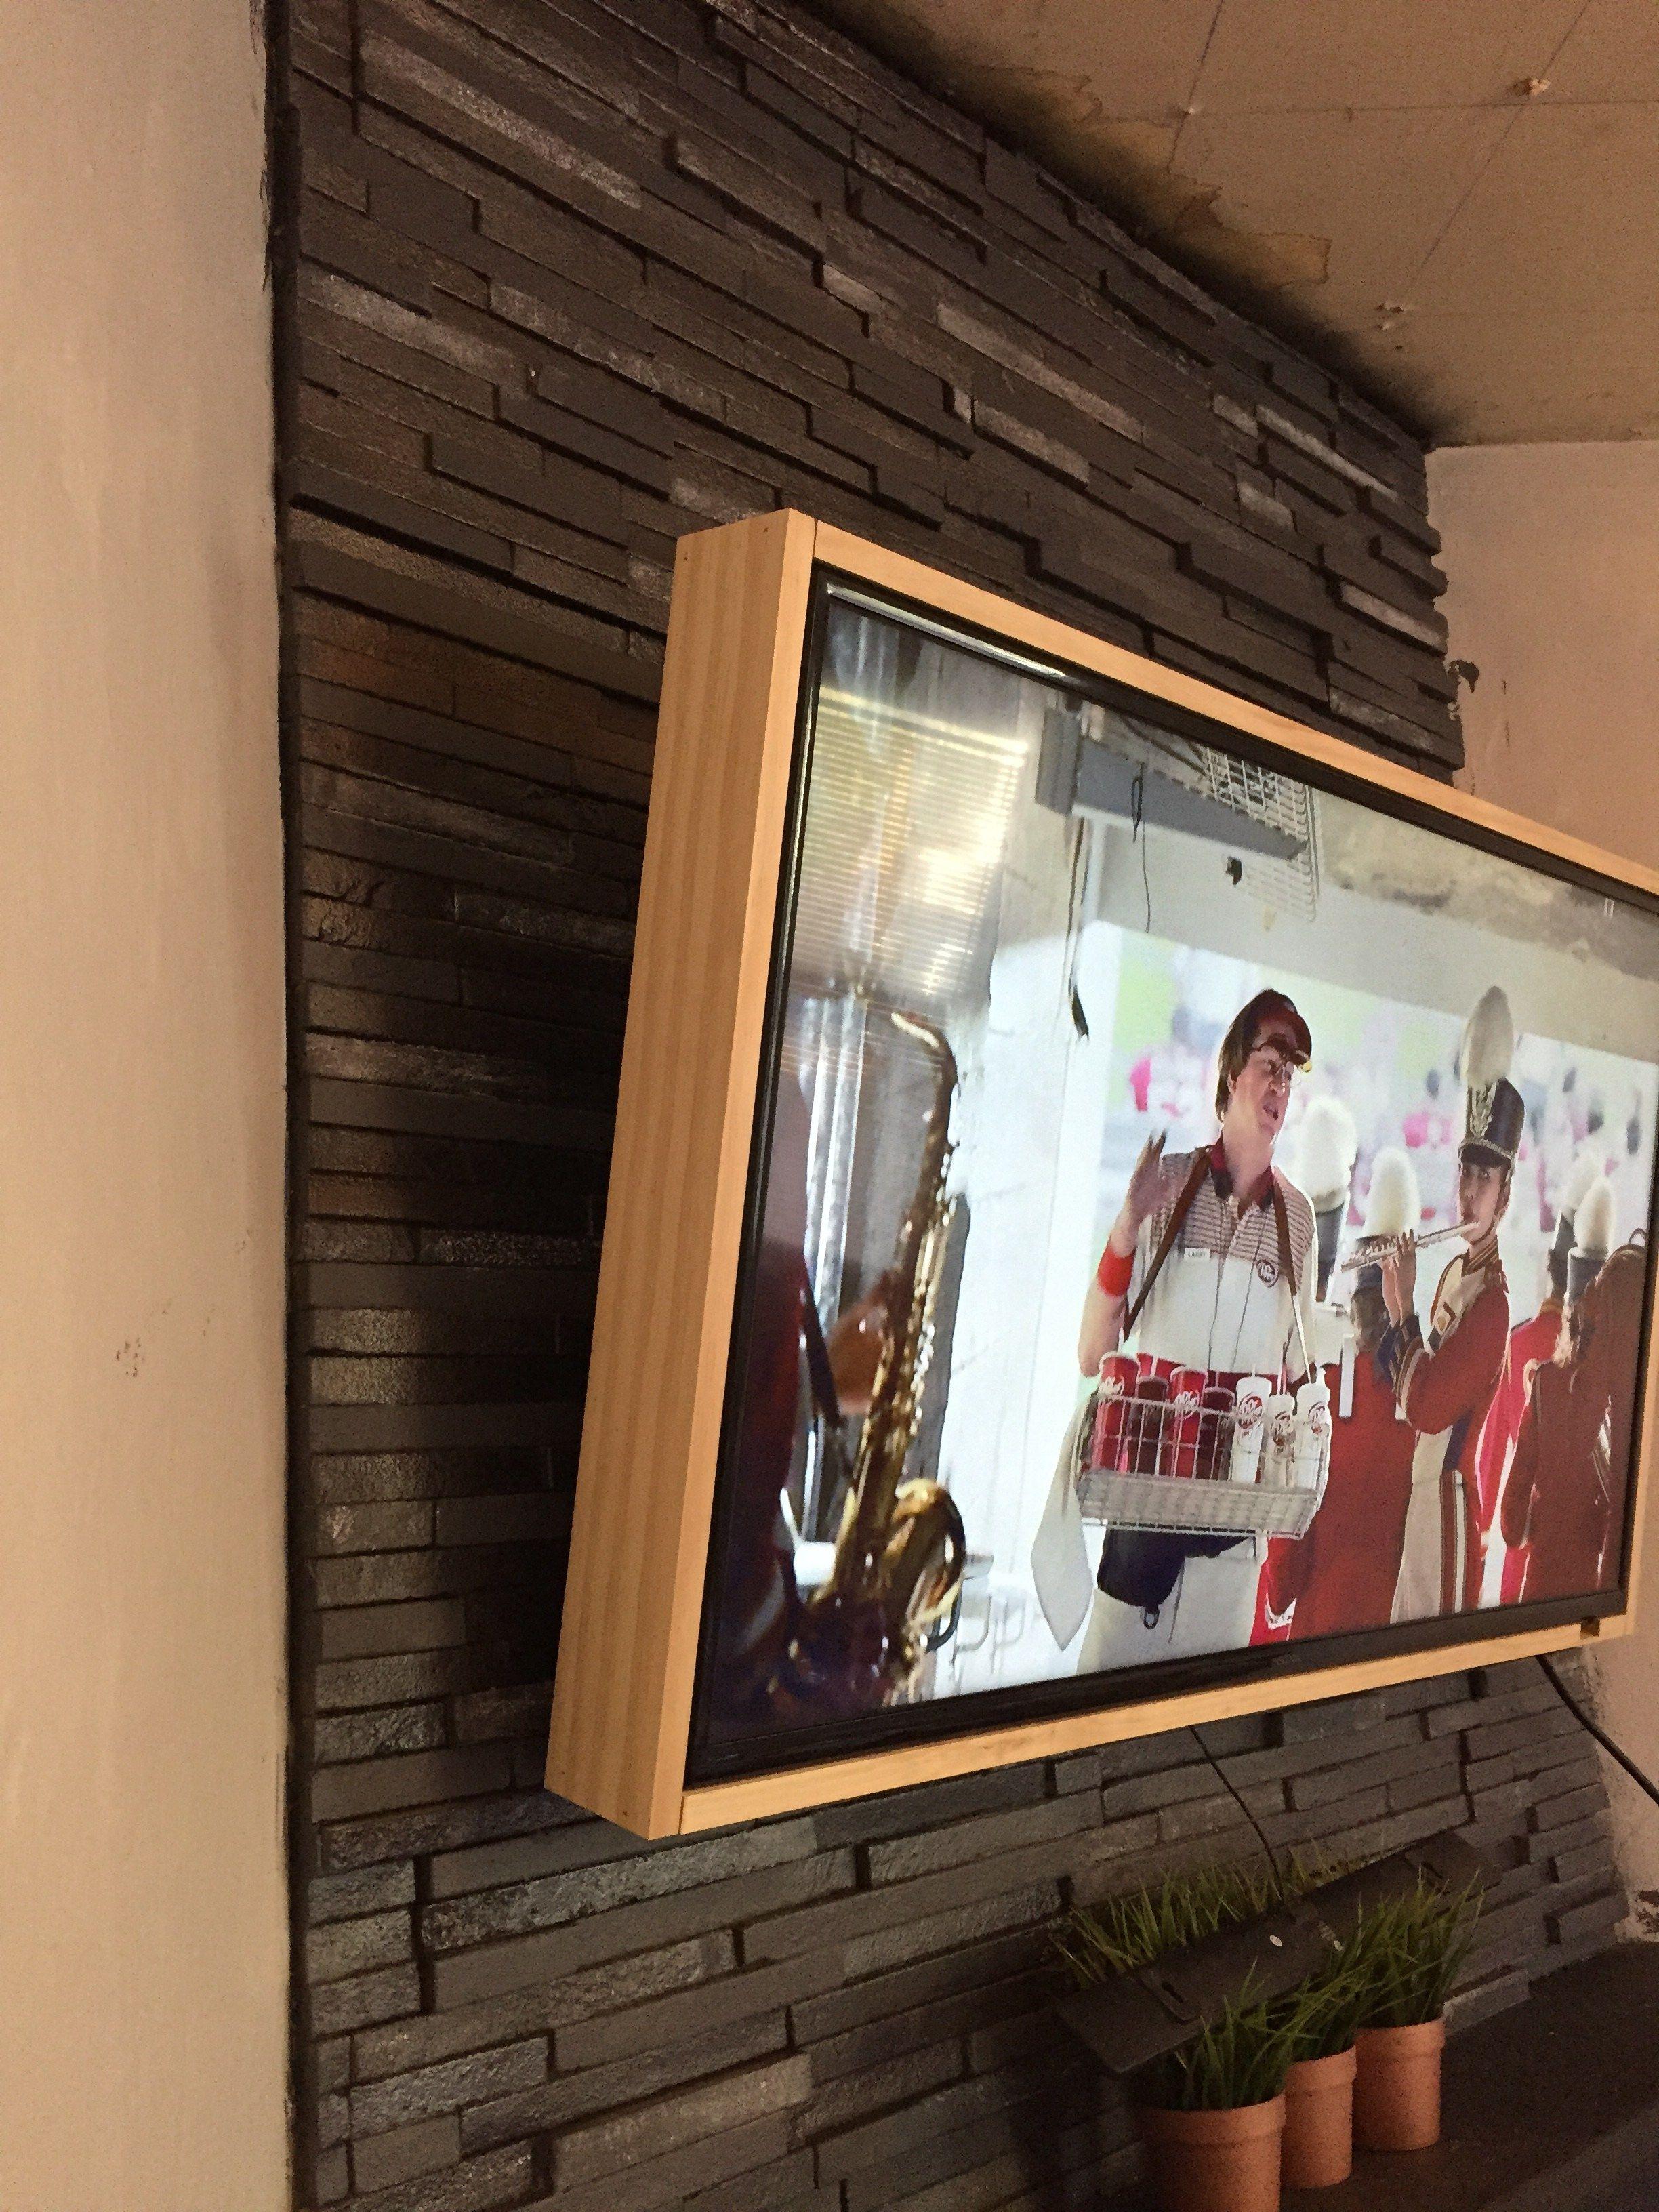 Diy 40 wood tv frame works for tvs that tilt and rotate